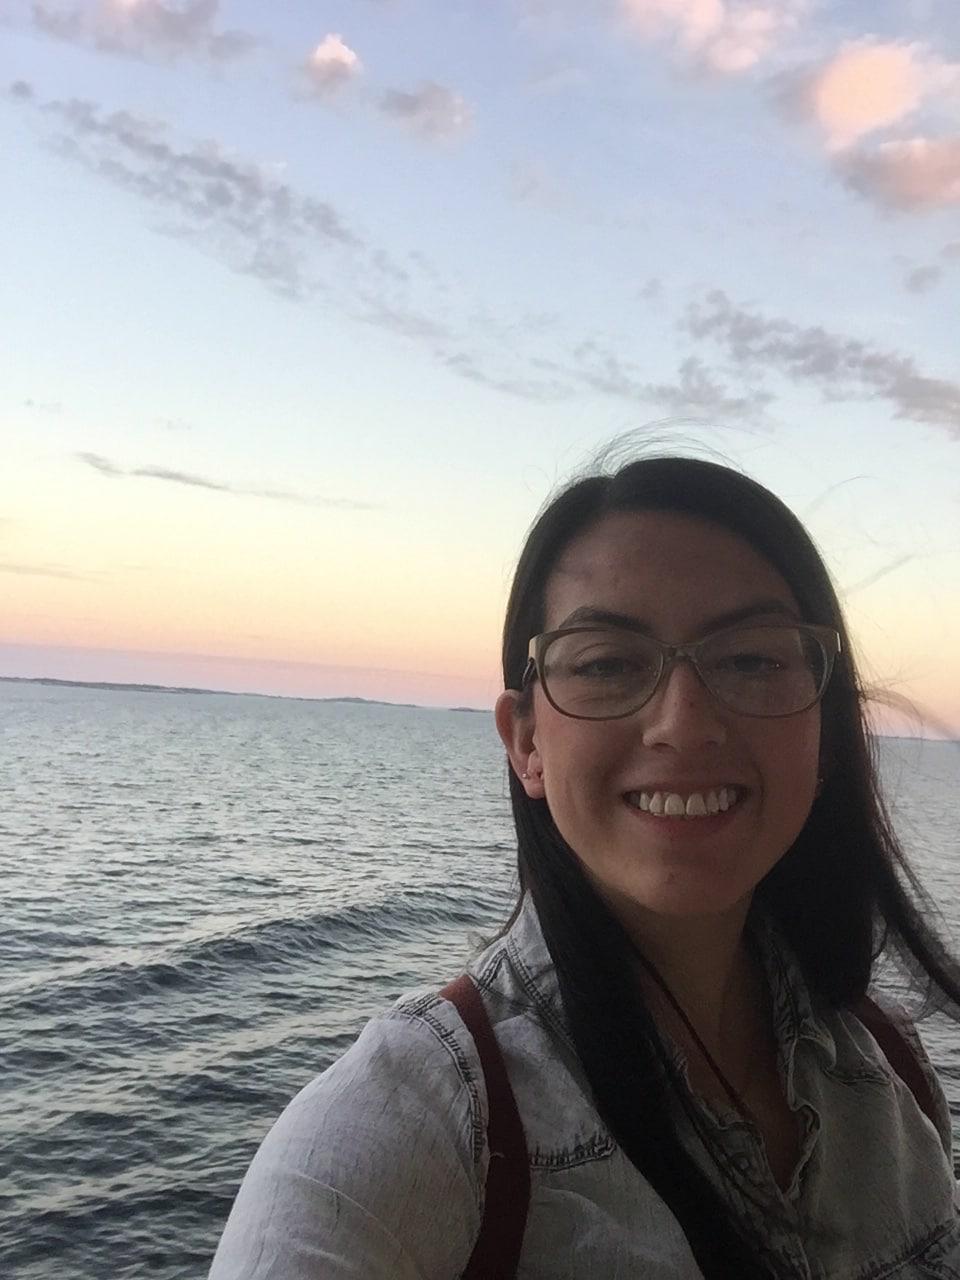 Jessica From Guadalajara, Mexico